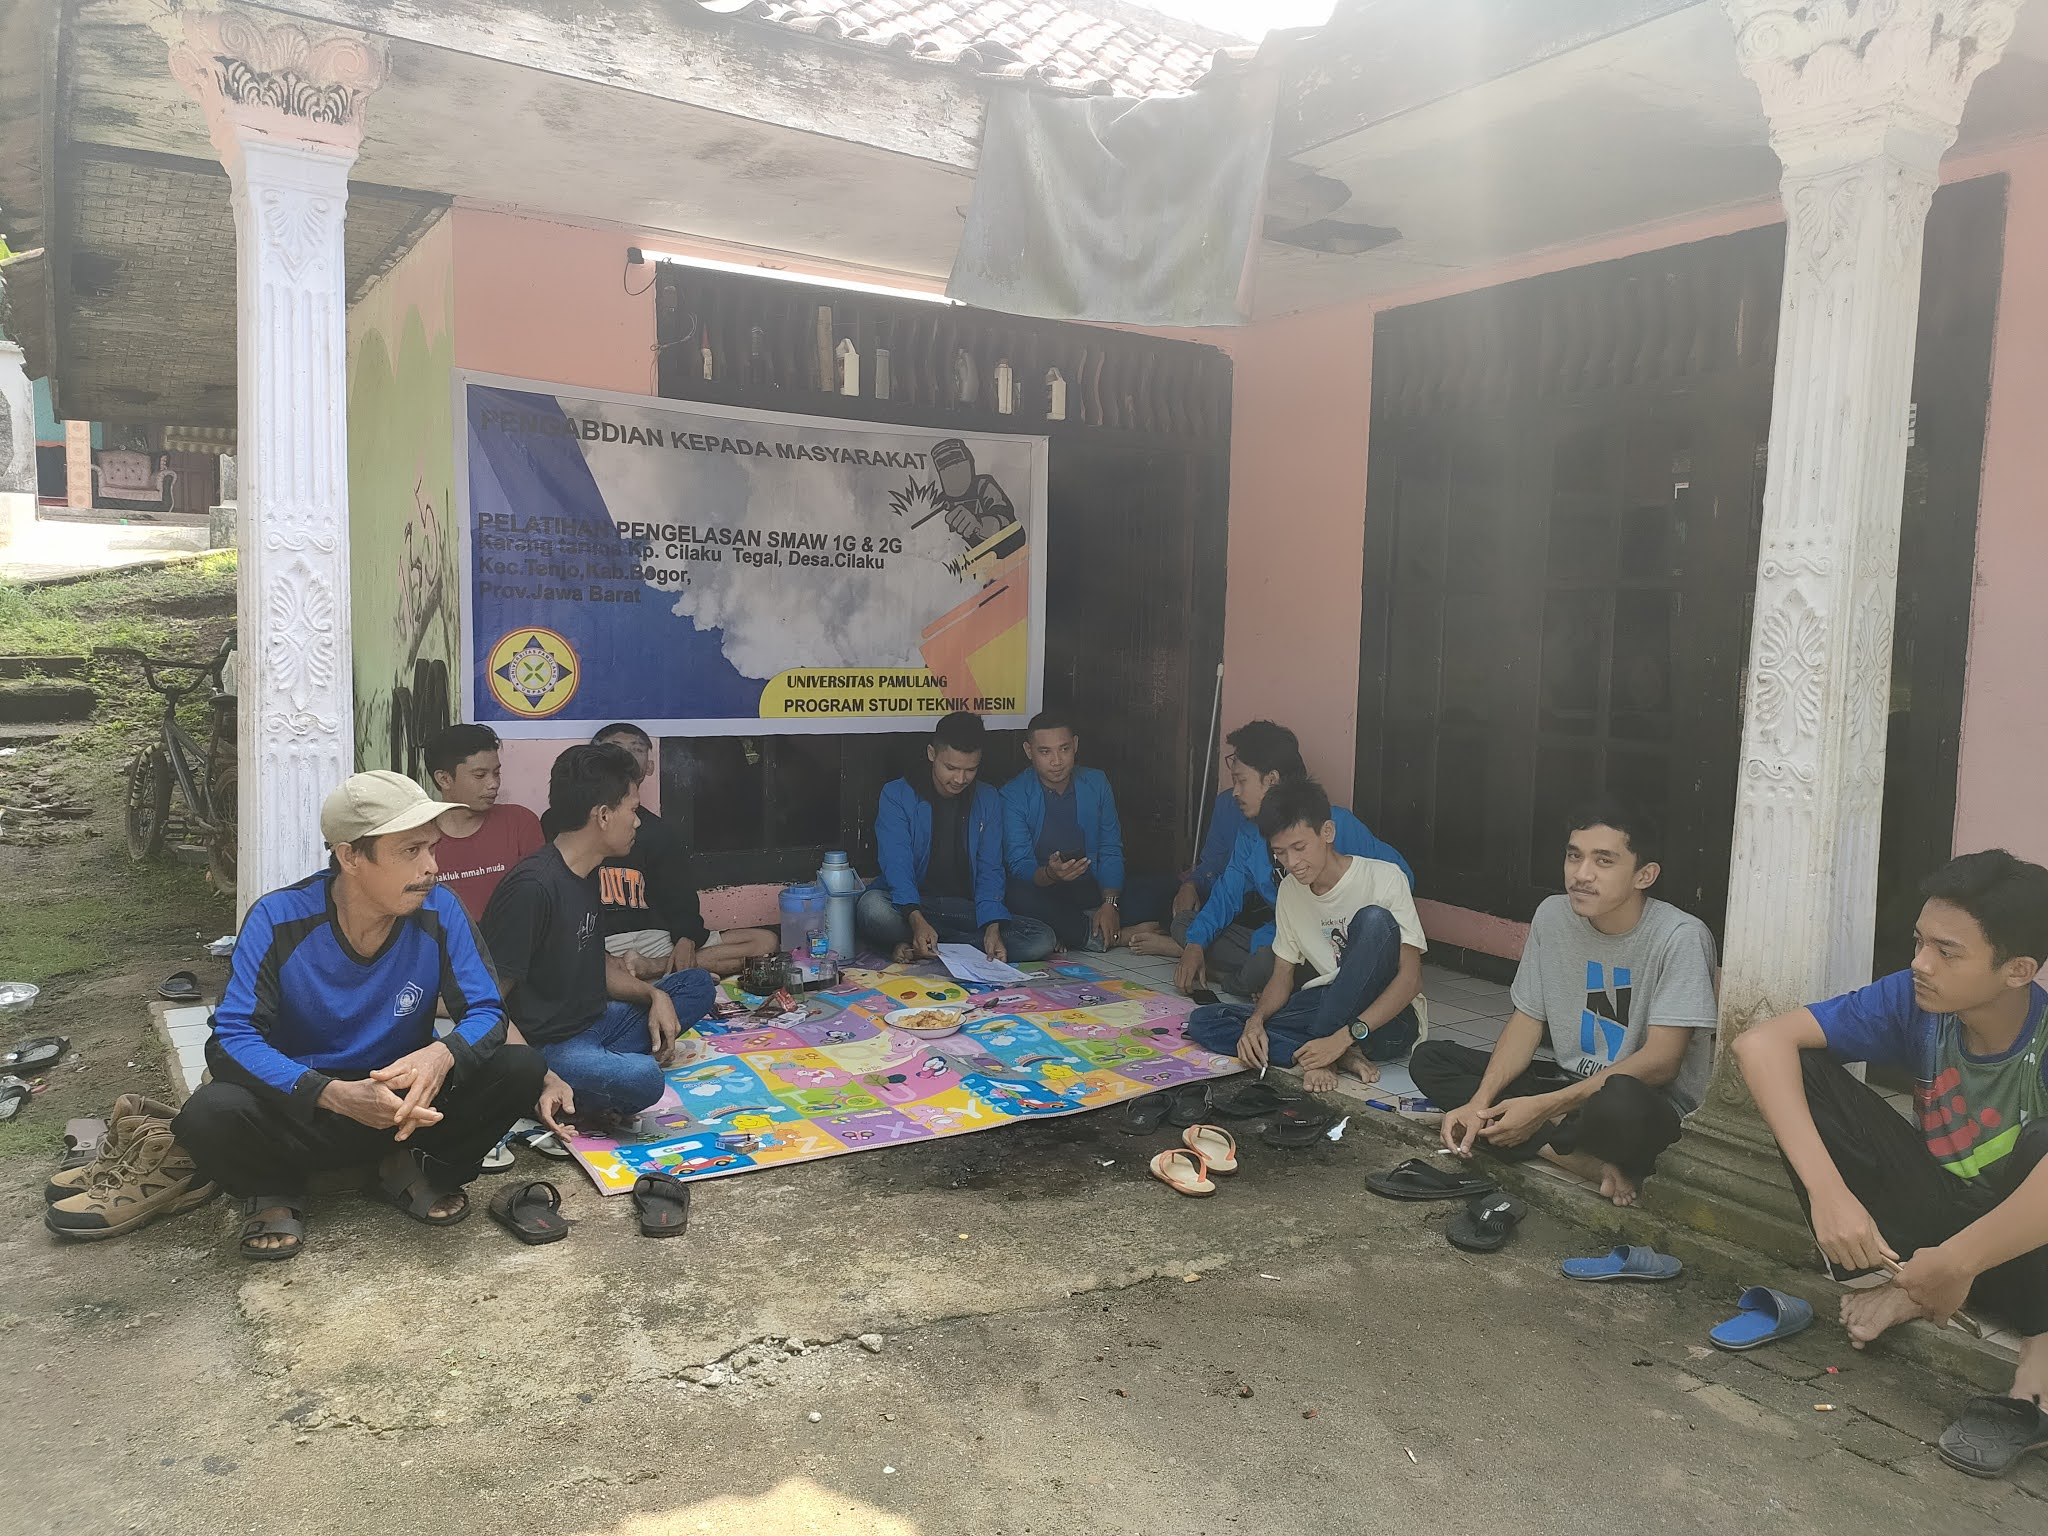 Edukasi Tentang Soft Skill Teknik Pengelasan SMAW 1 G Pada PKM Mahasiswa UNPAM Di Kampung Cilaku